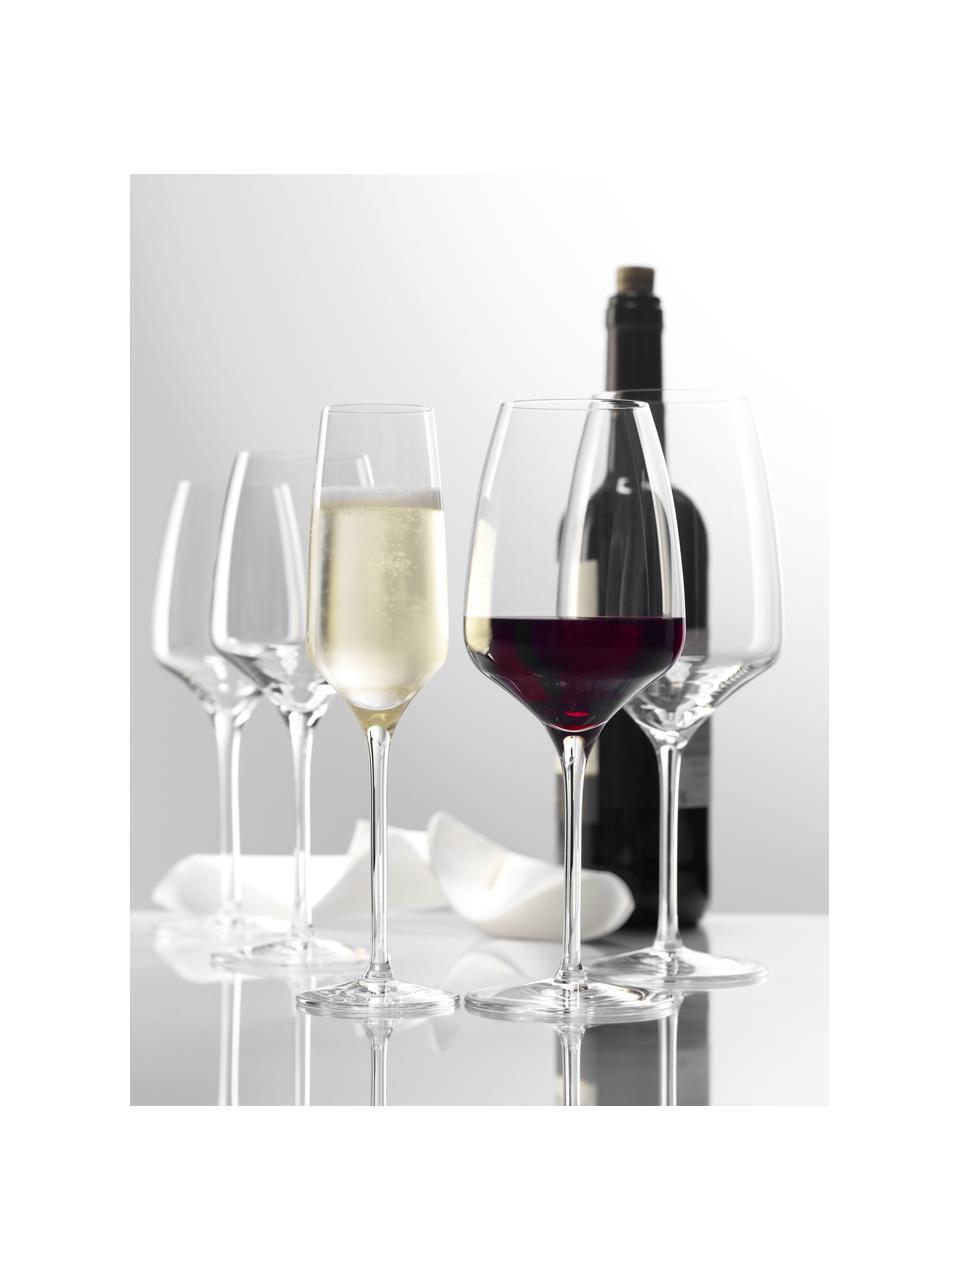 Kristall-Rotweingläser Experience, 6 Stück, Kristallglas, Transparent, Ø 8 x H 23 cm